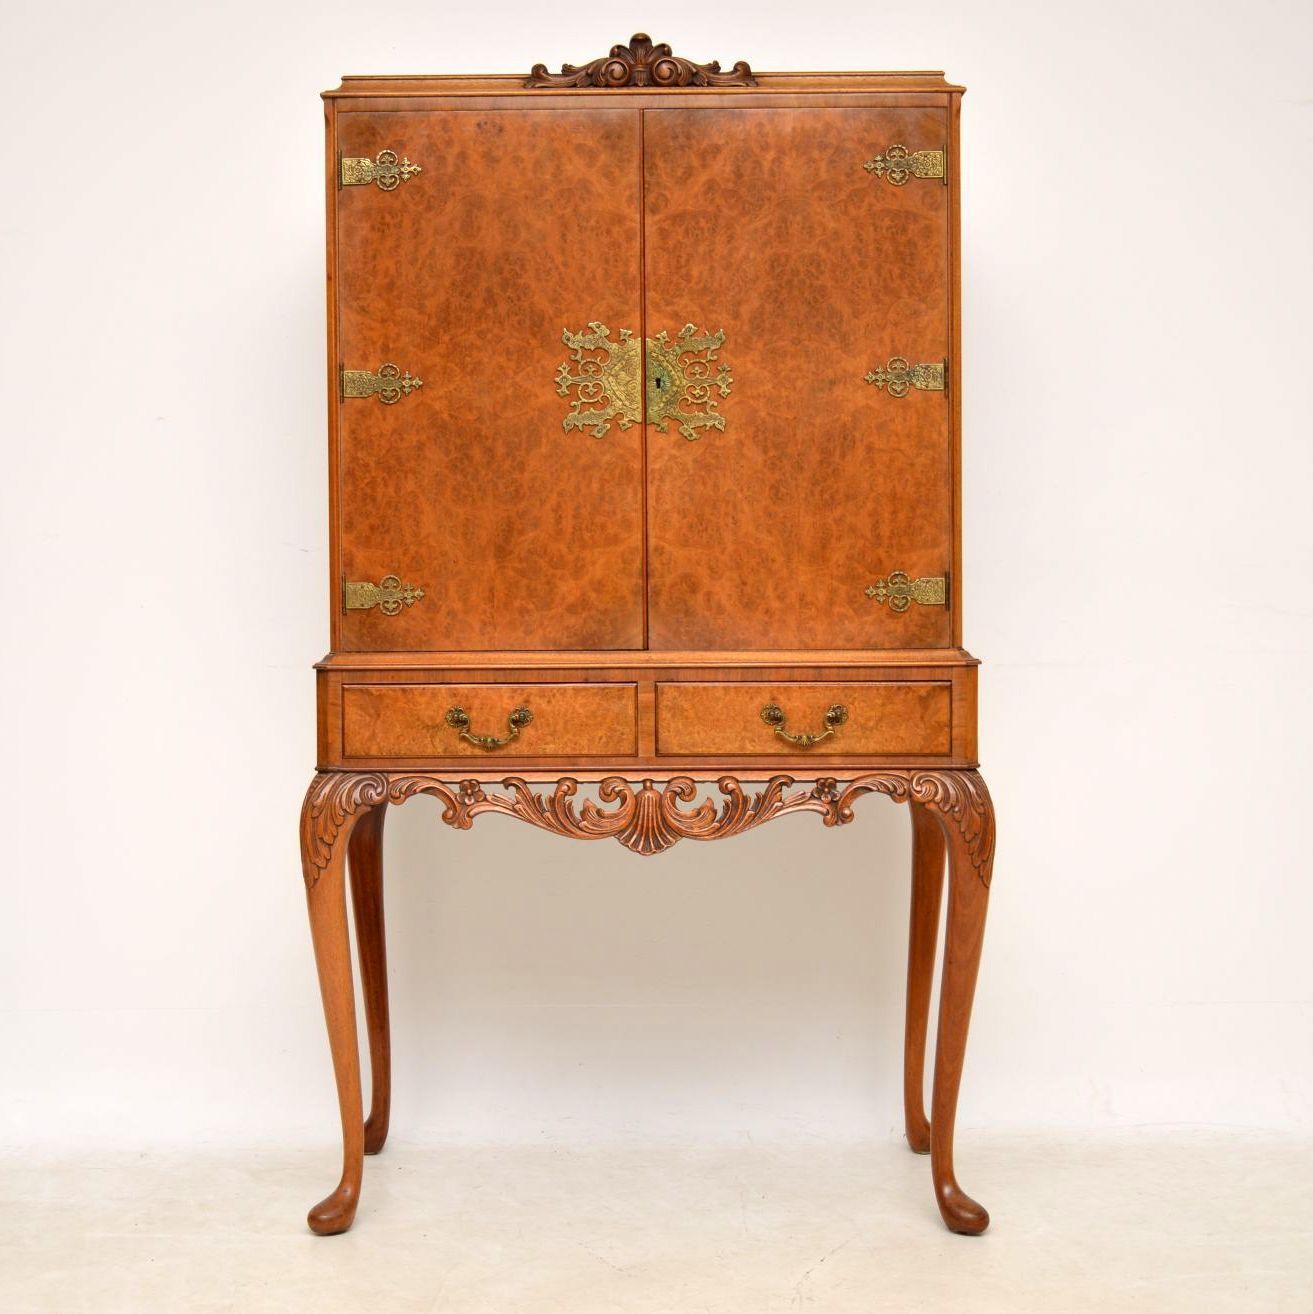 Antique Queen Anne Style Burr Walnut Cocktail Cabinet